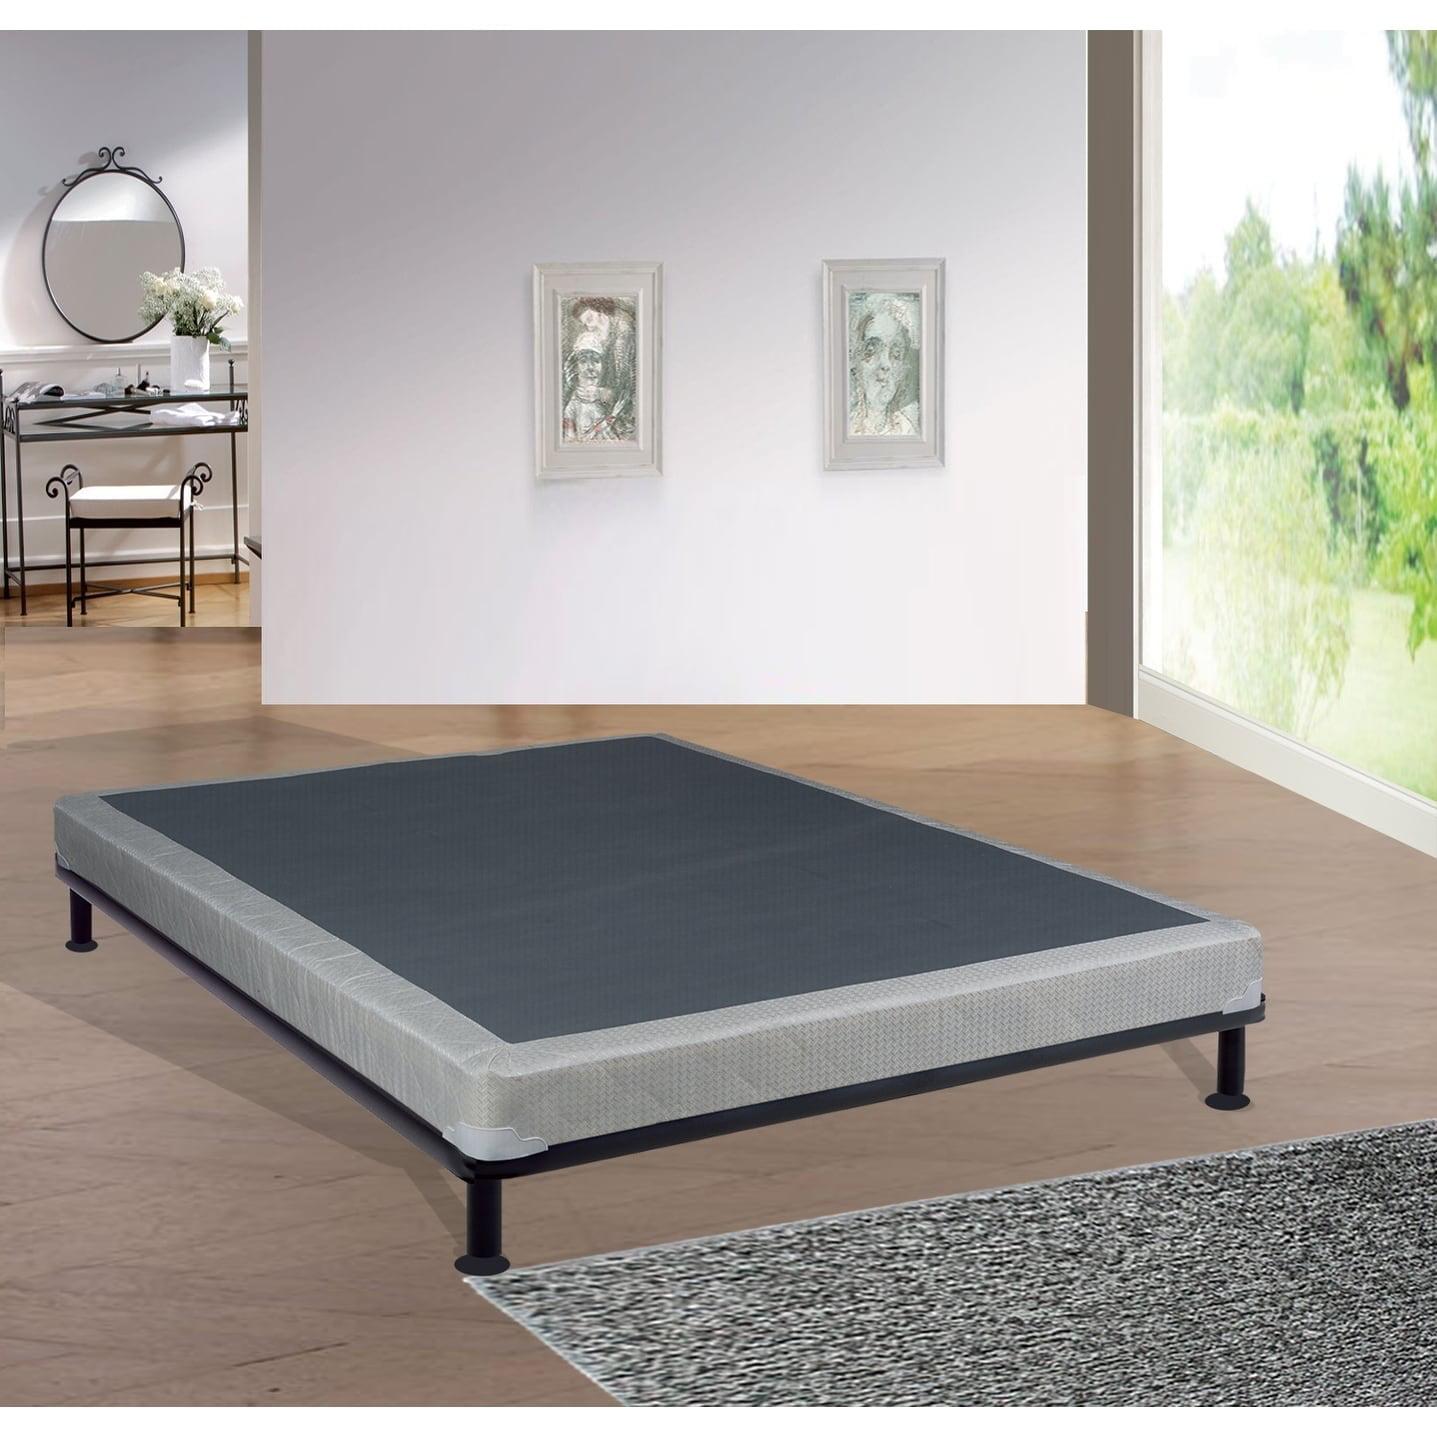 Continental Sleep  5-Inch Foundation Box Spring for Mattress